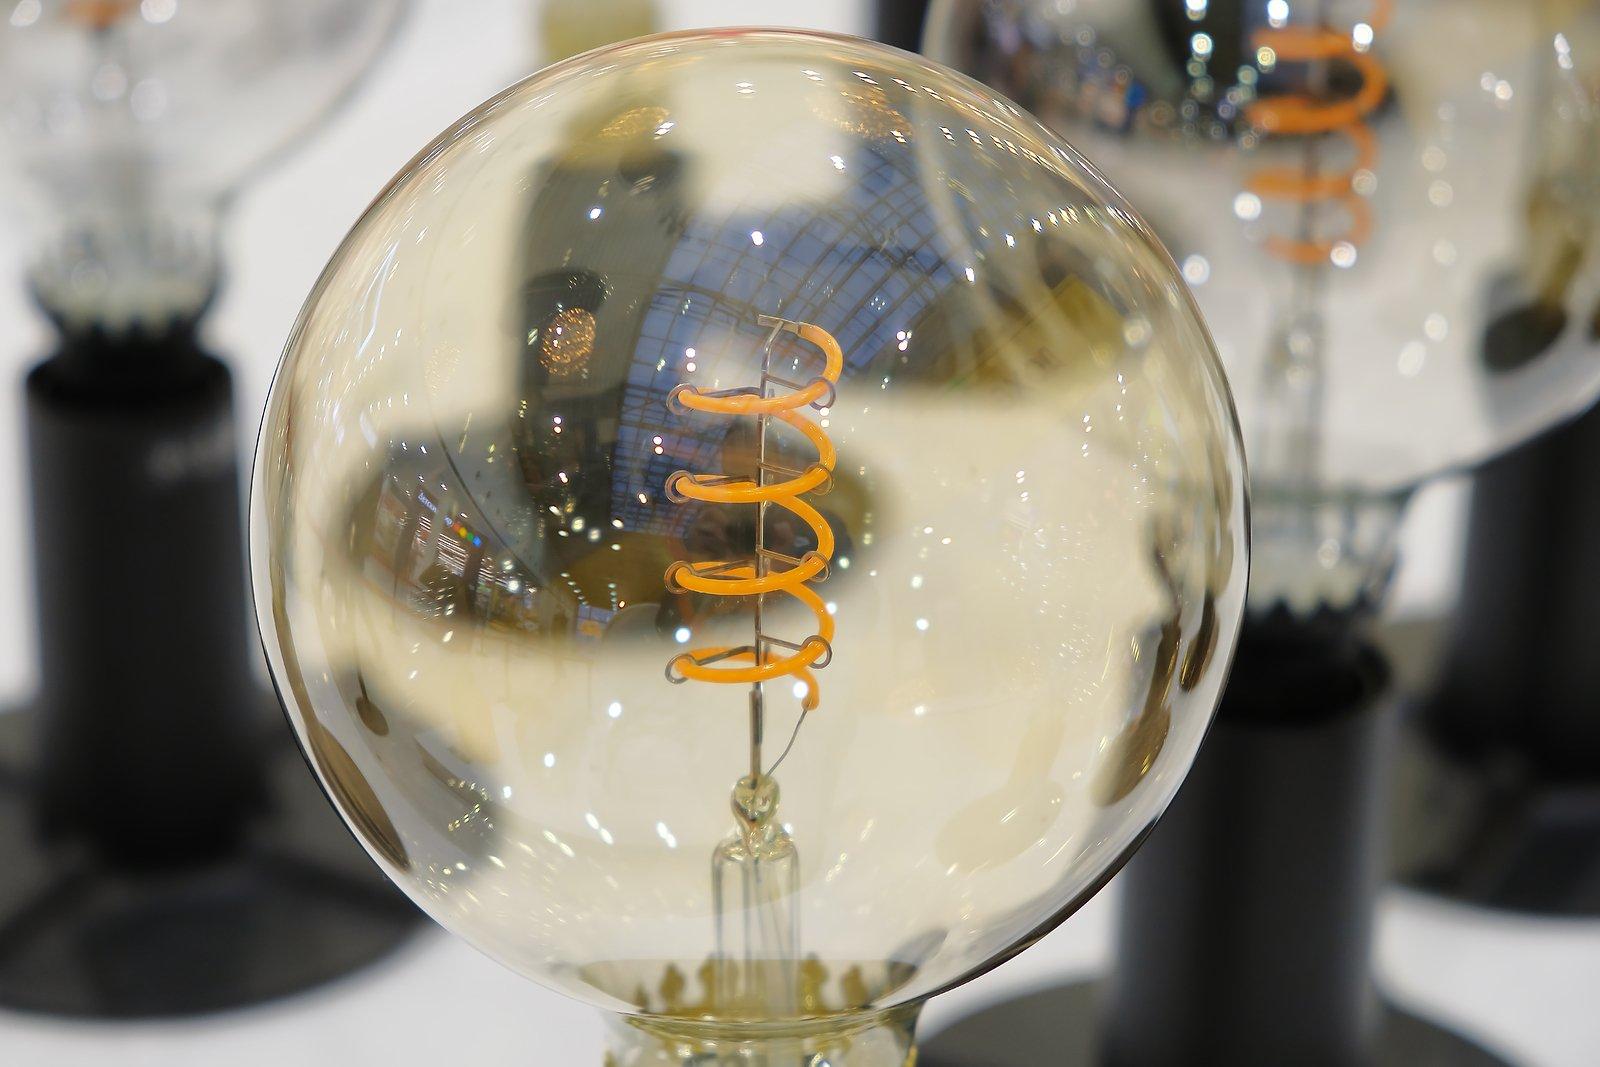 bigstock-Retro-Light-Bulb-On-The-Backgr-401835365